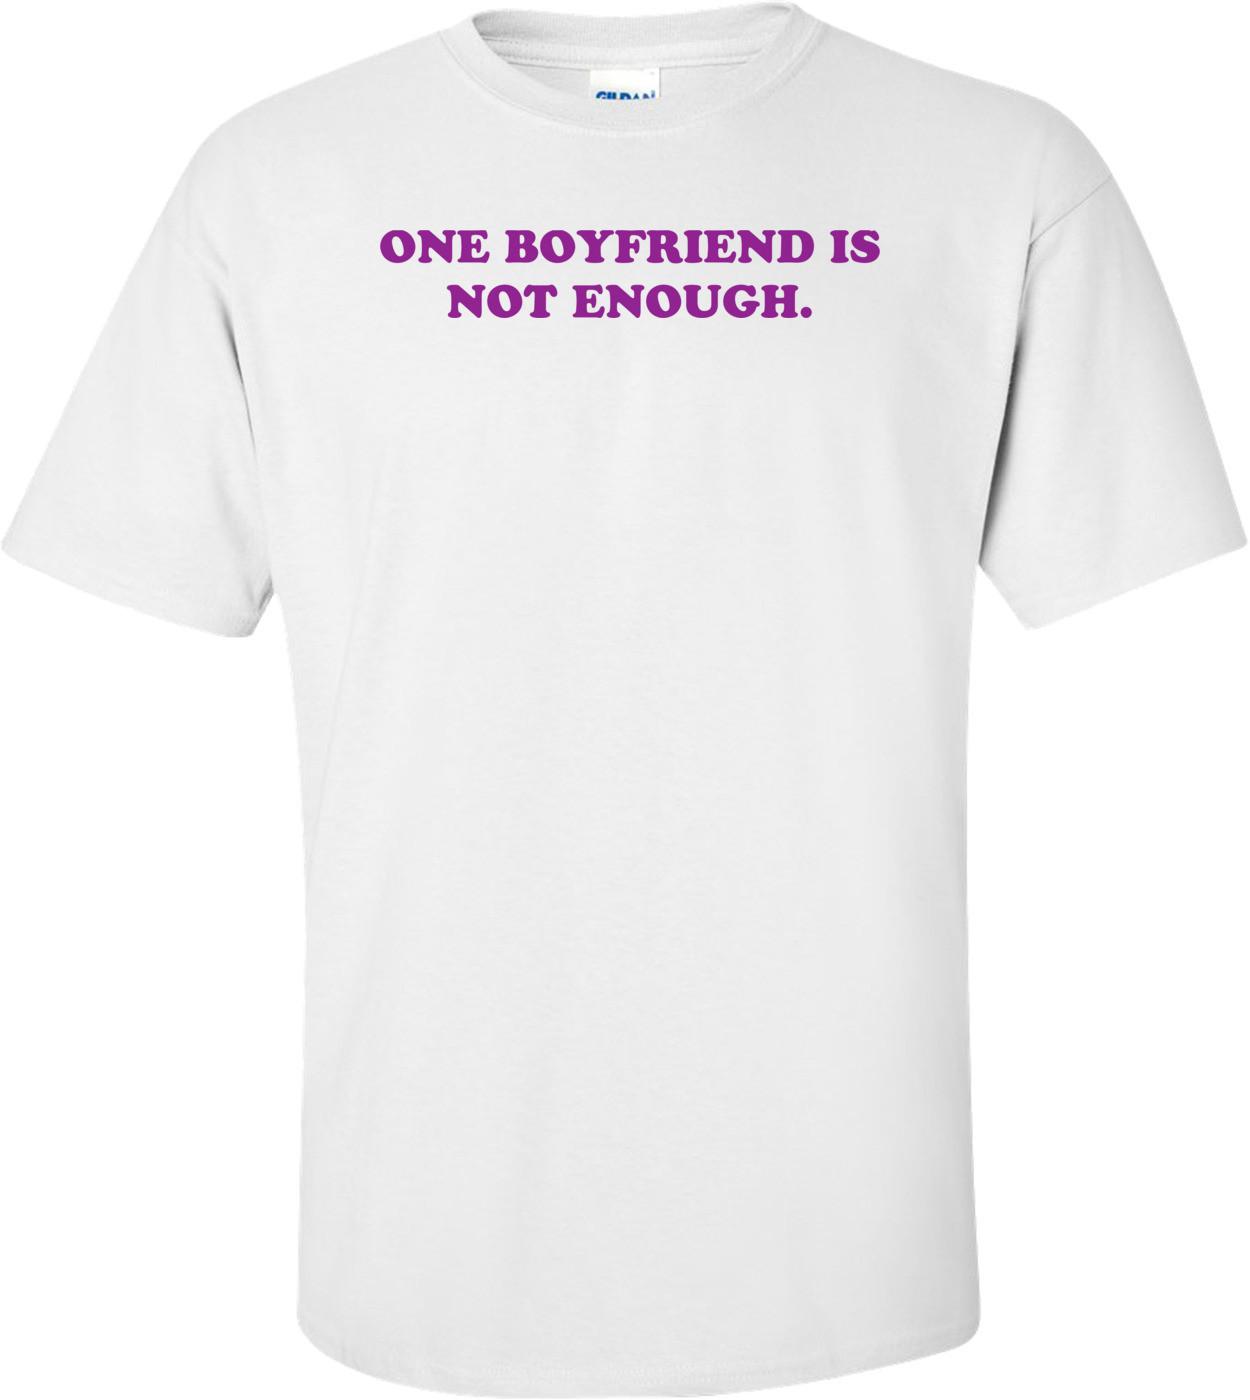 ONE BOYFRIEND IS NOT ENOUGH. Shirt